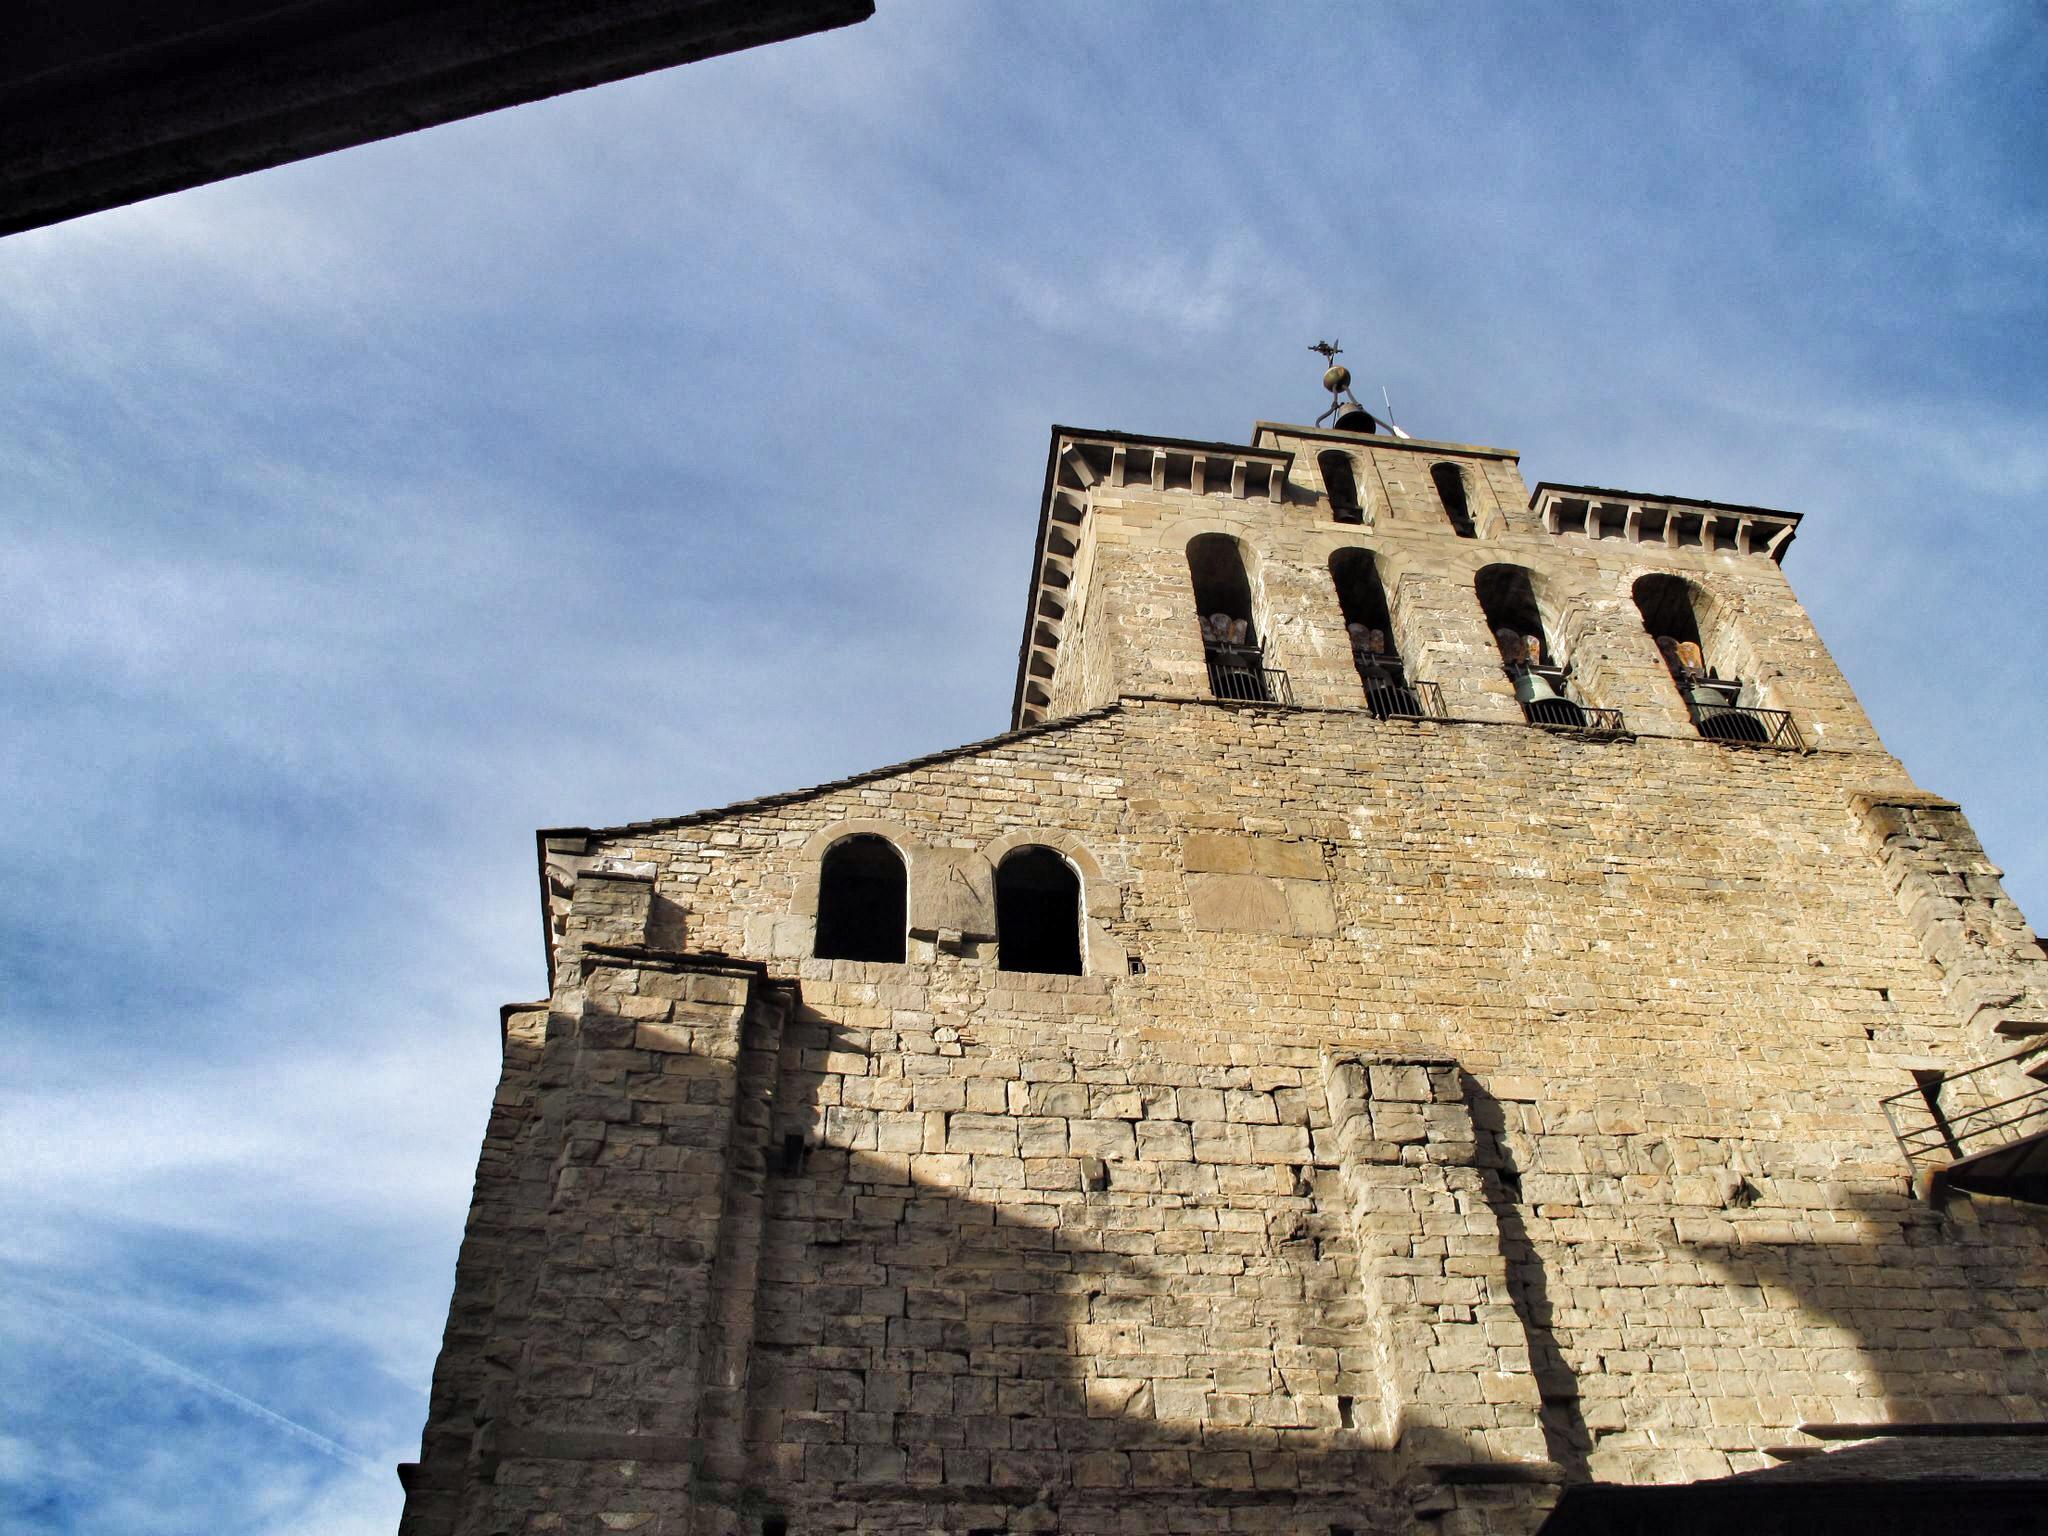 museo diocesano de jaca_catedrall